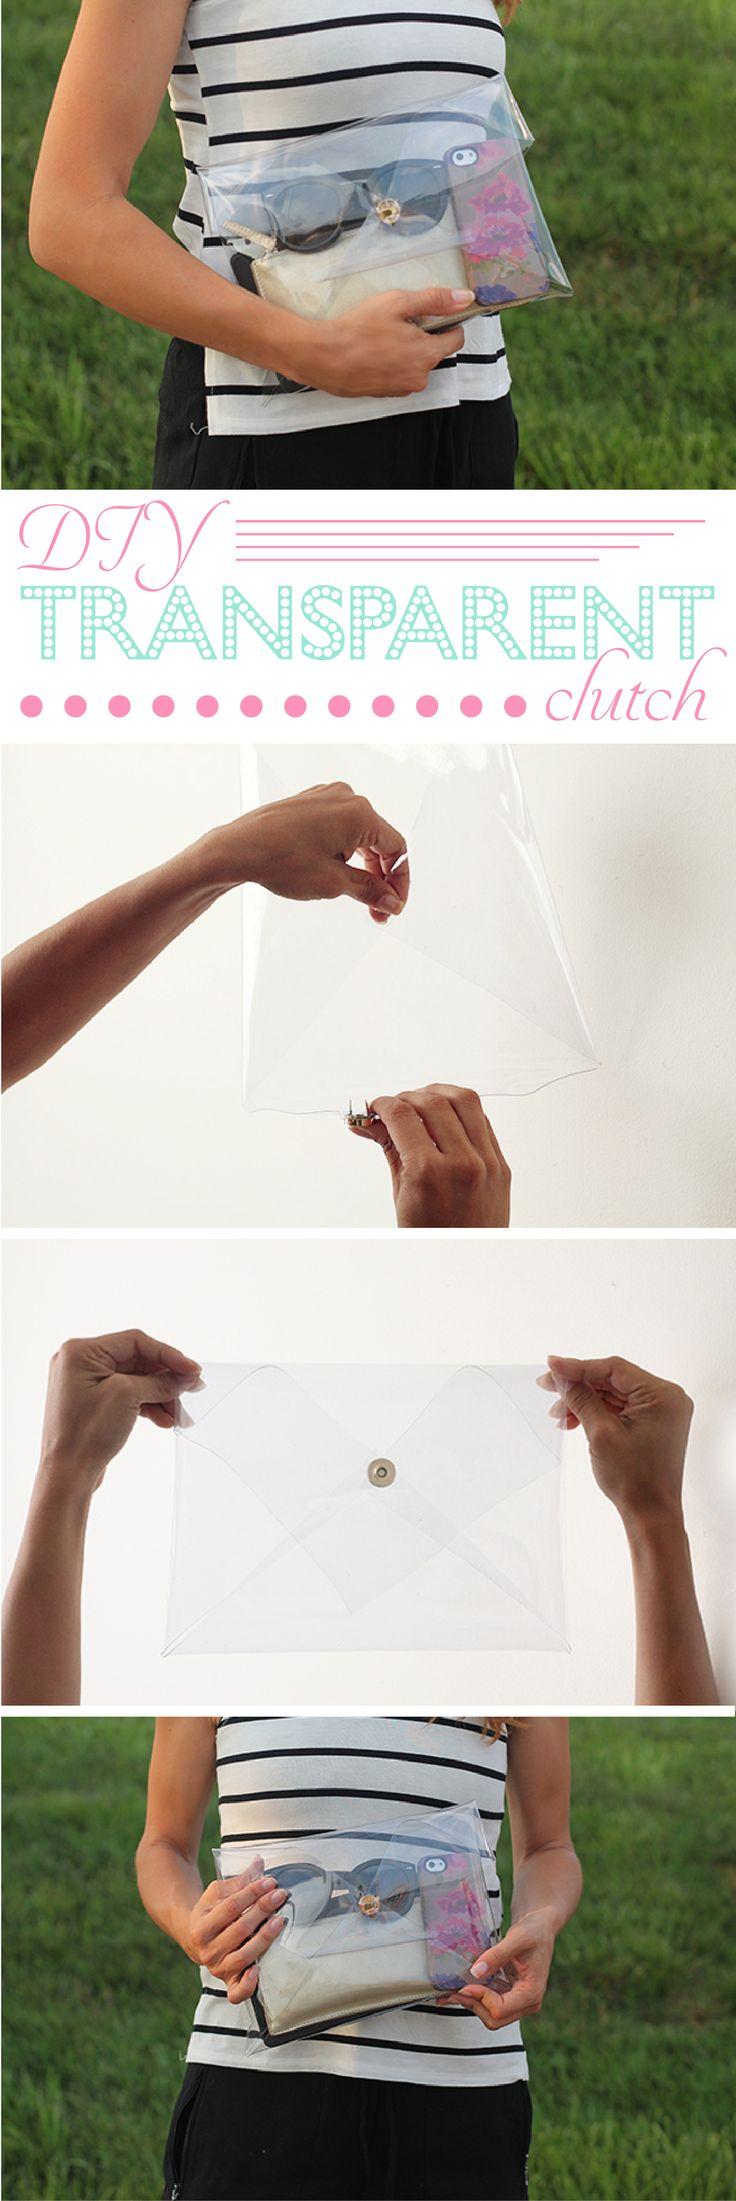 best 25+ transparent clutch ideas on pinterest | diy bags clutch